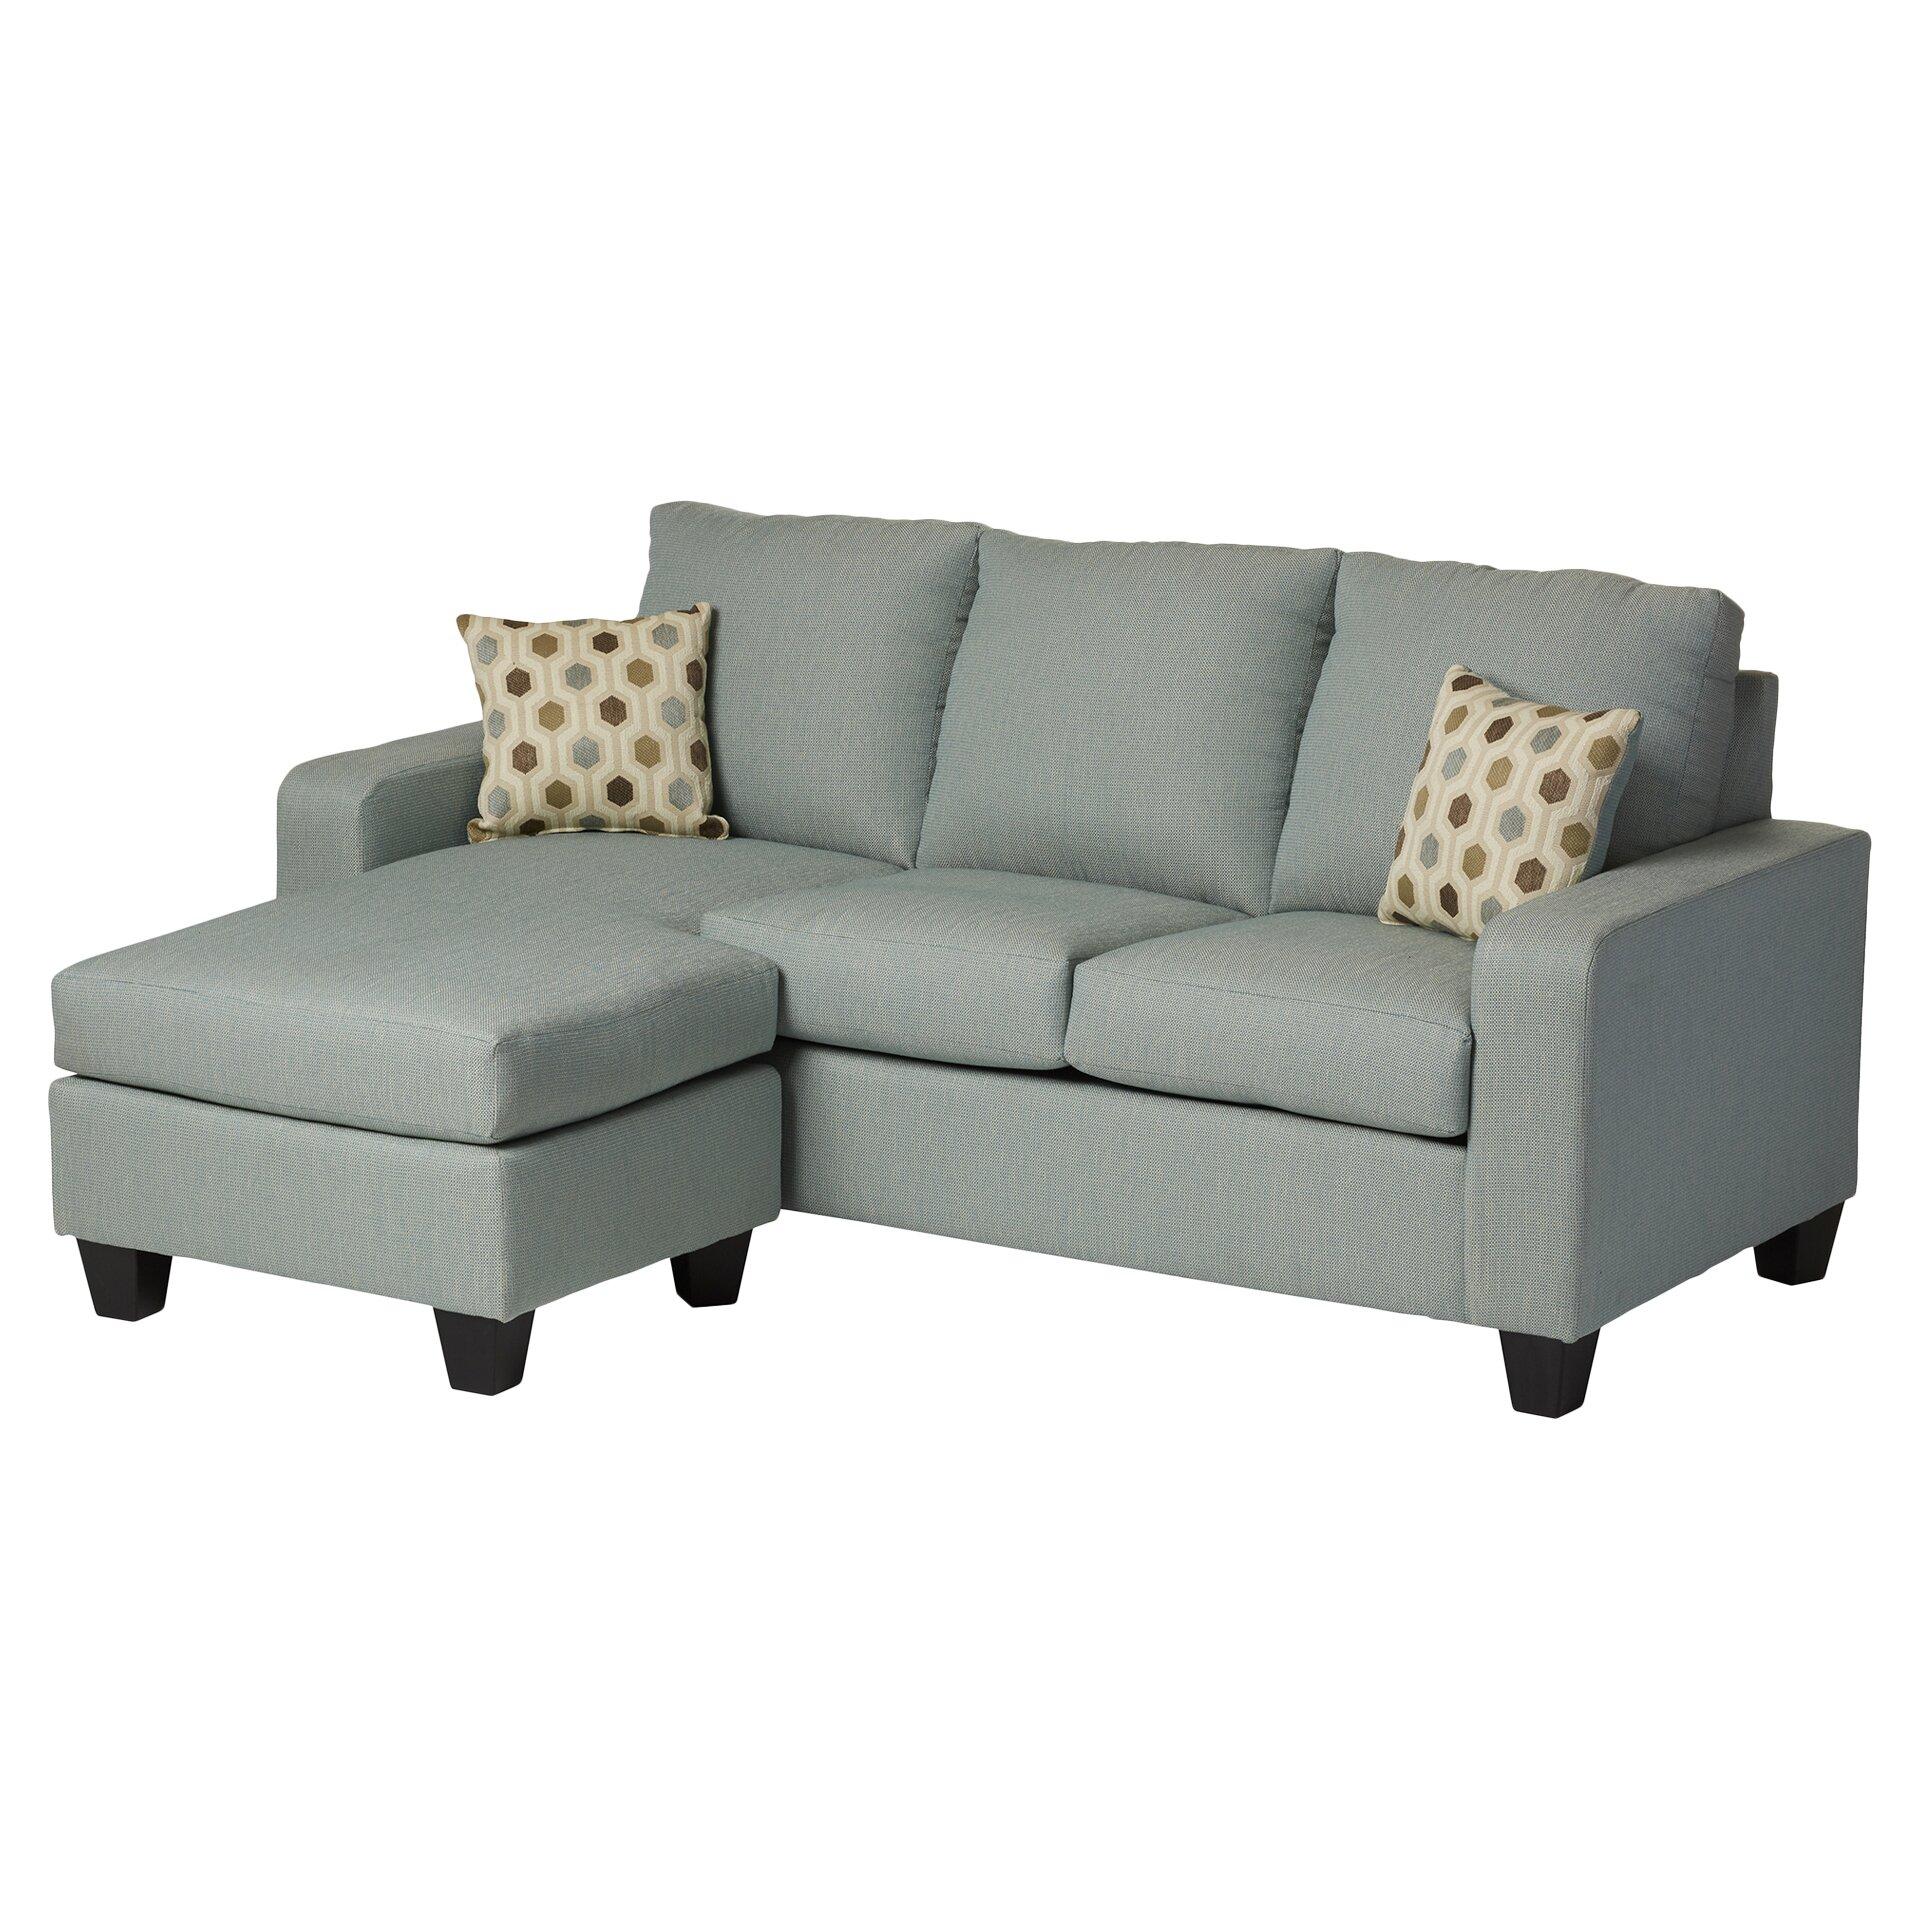 Mercury row morpheus reversible sectional reviews wayfair Sectional sofa prices